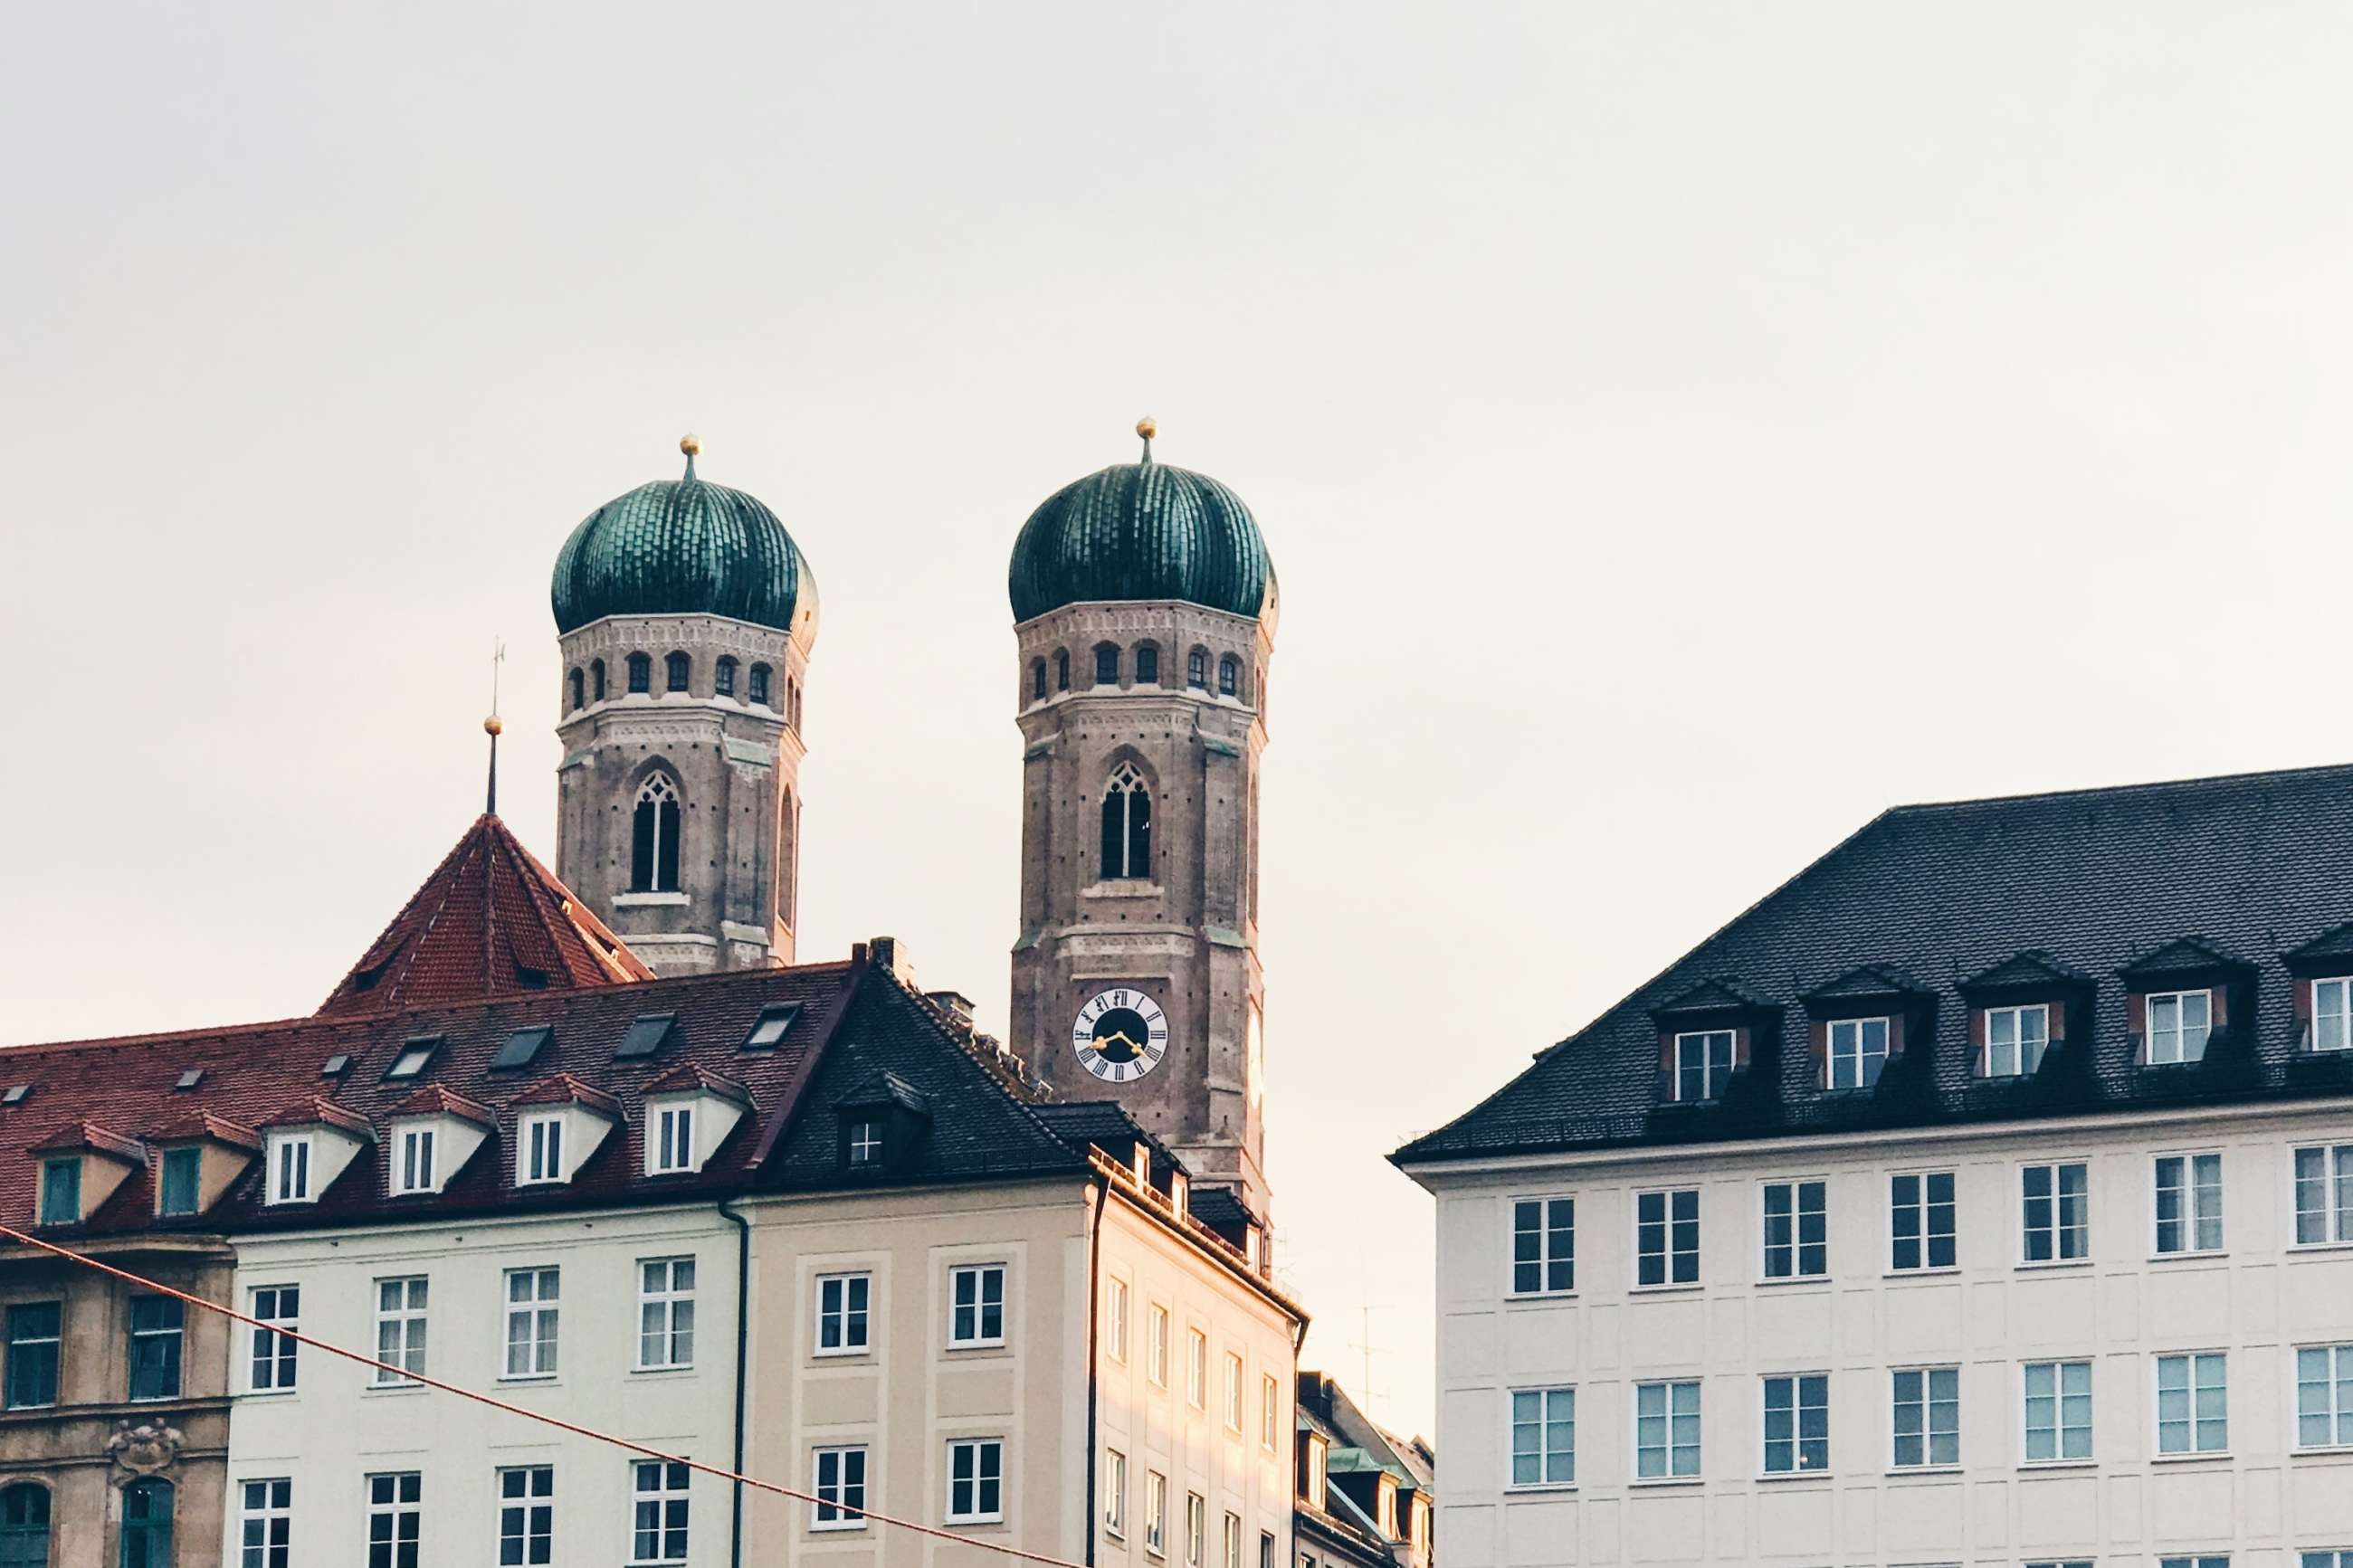 Munich Private Tours and Munich Small Group Tours